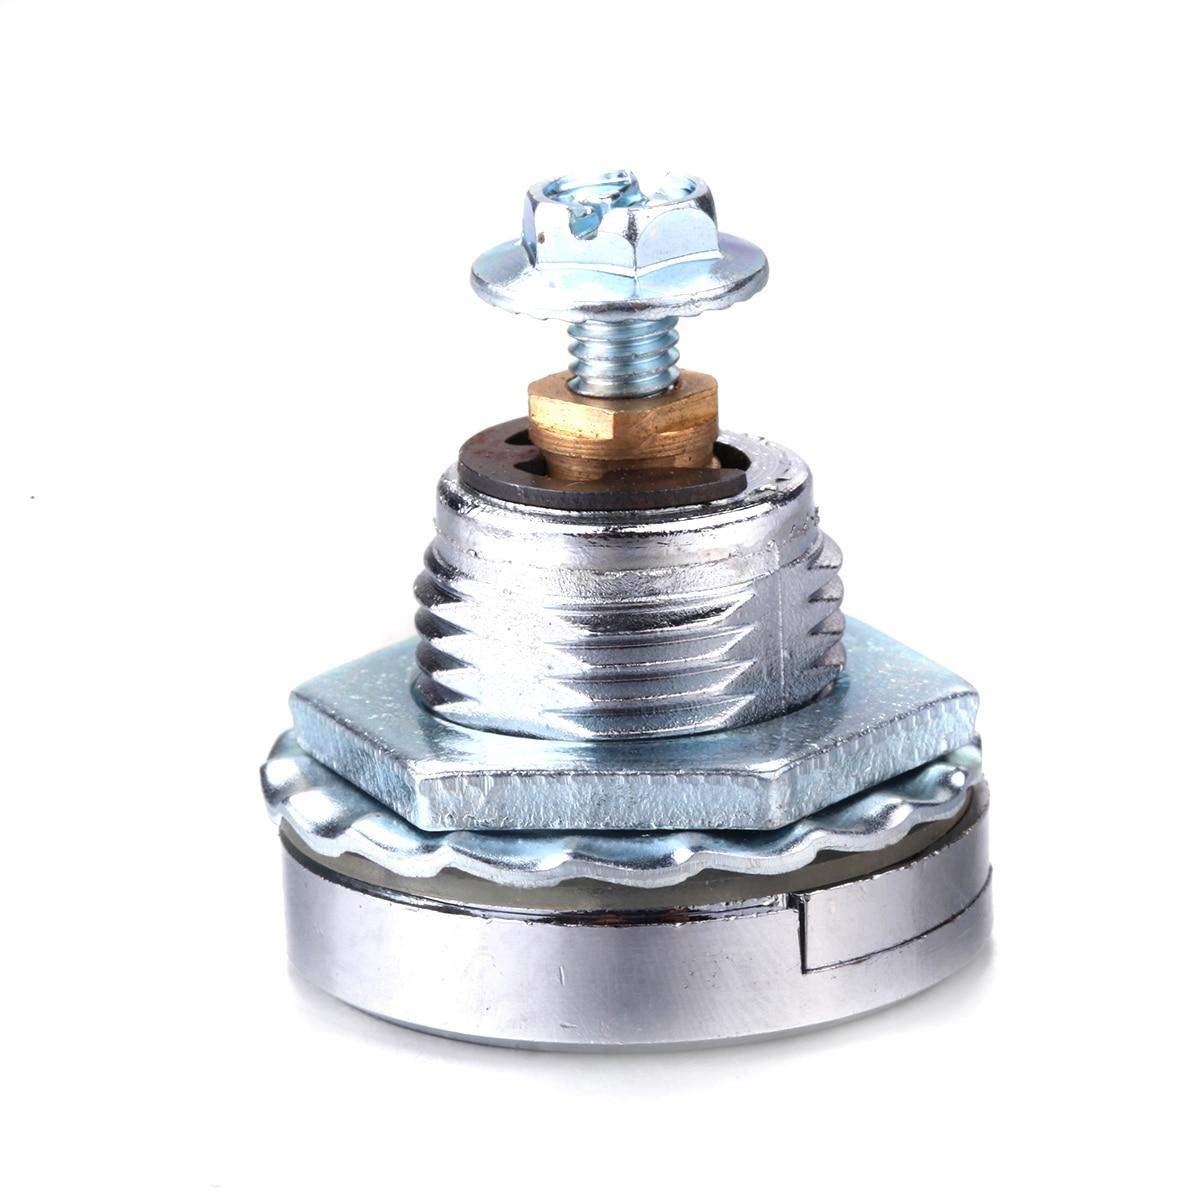 1pcs Waterproof Covered Cam Lock Cabinet Safe Letter Mail Box Key Lock 18mm  w/ 2 Keys